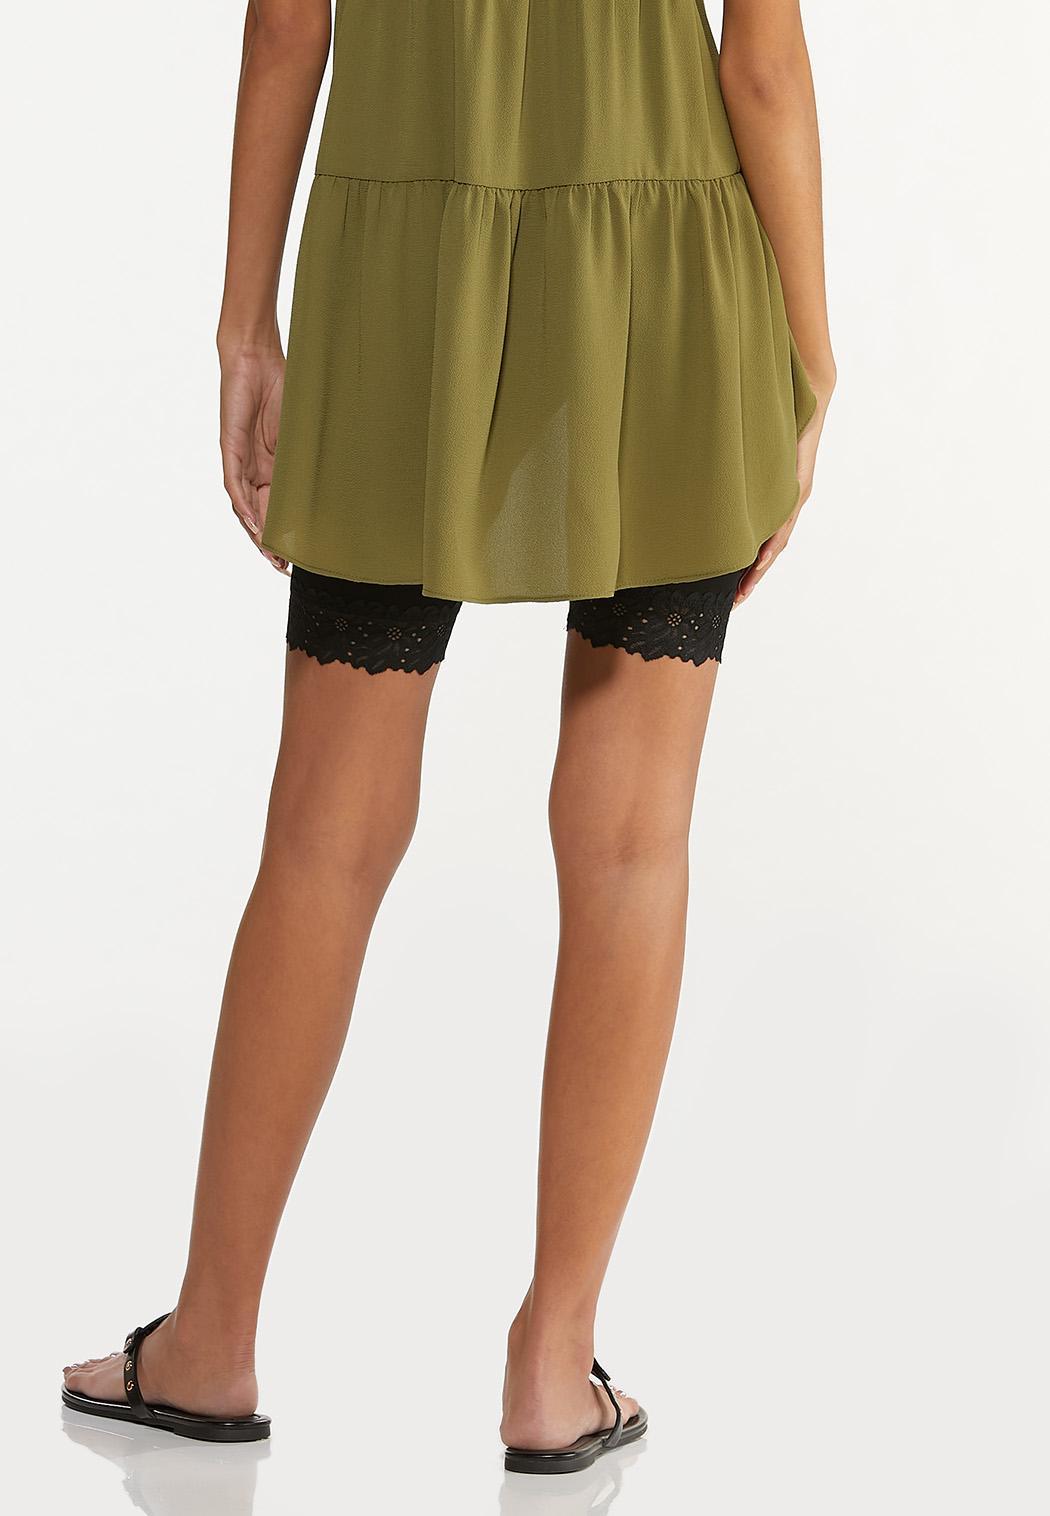 Lace Trim Biker Shorts (Item #44605746)